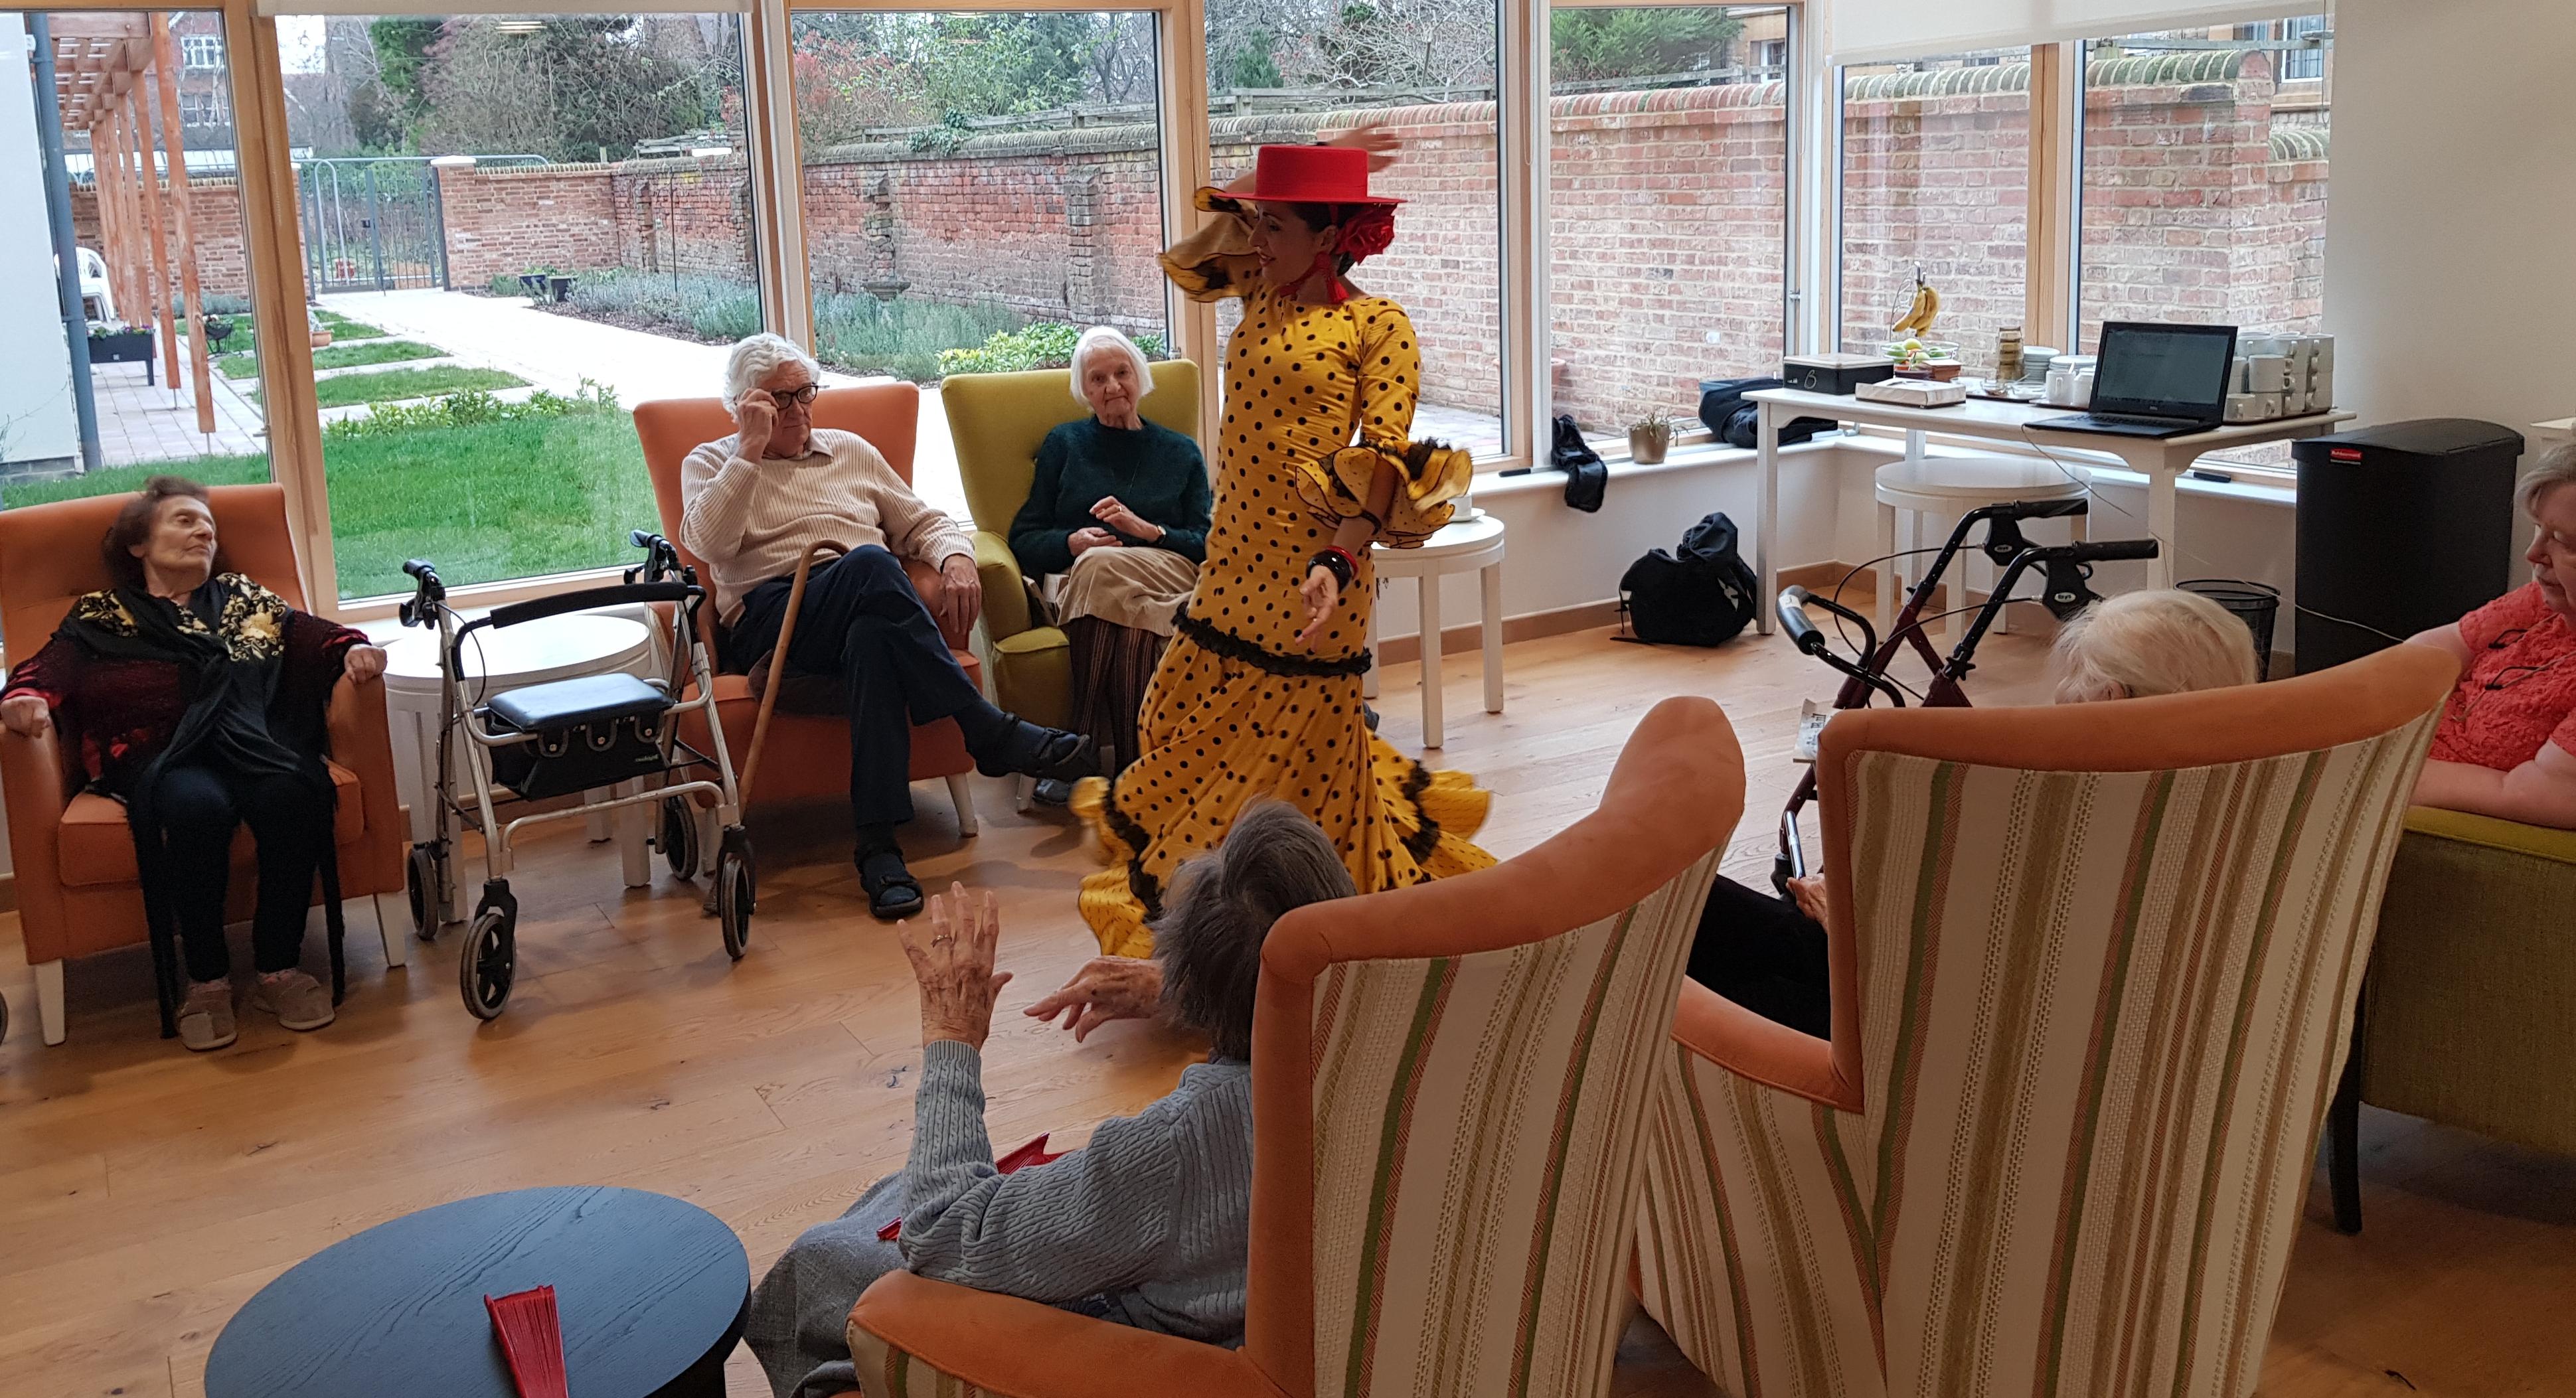 Flamenco dancer visits Fairfield